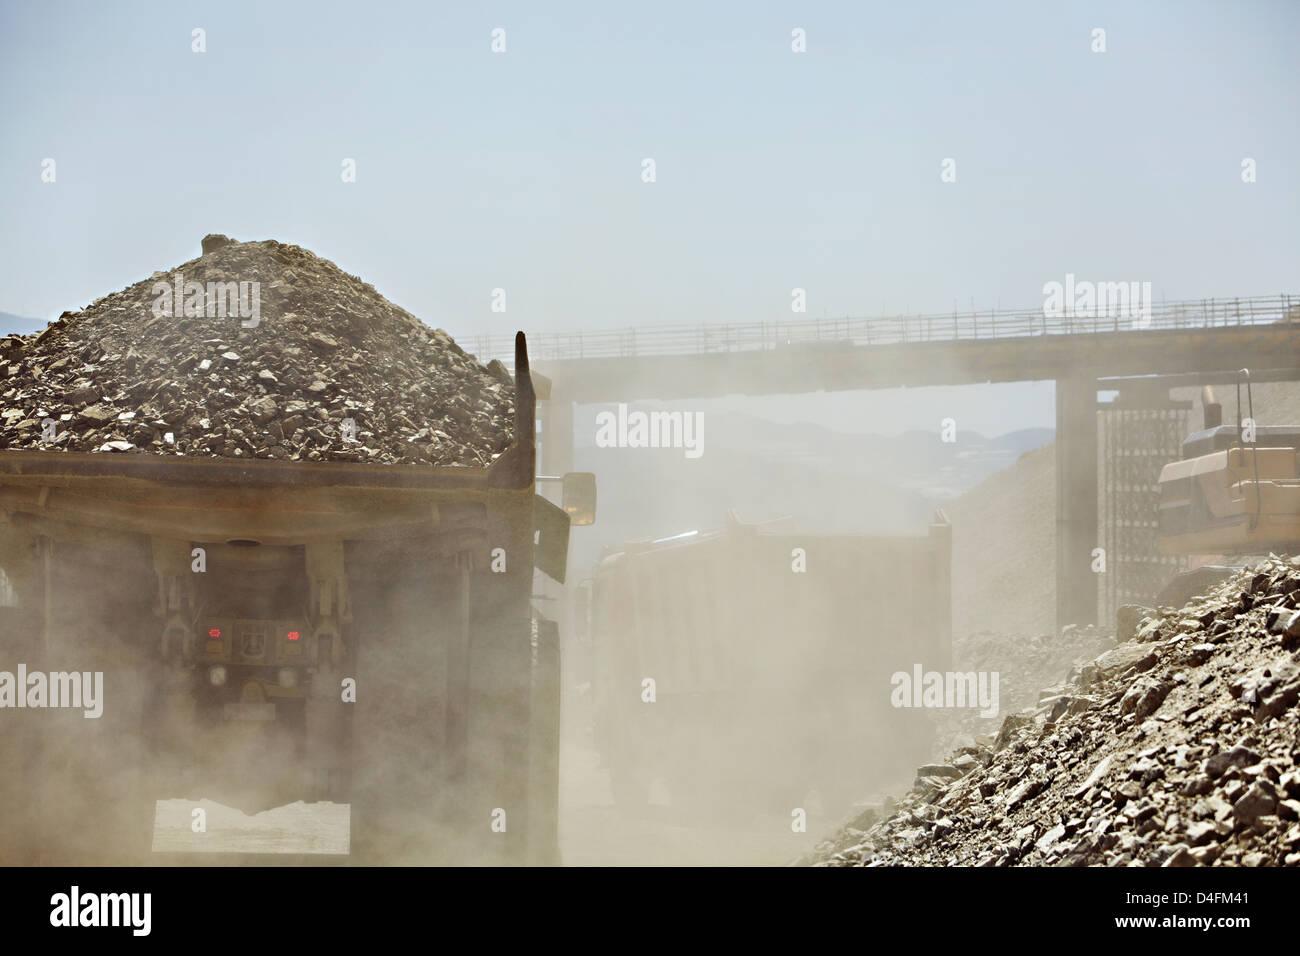 LKW-Kart Schutt im Steinbruch Stockbild